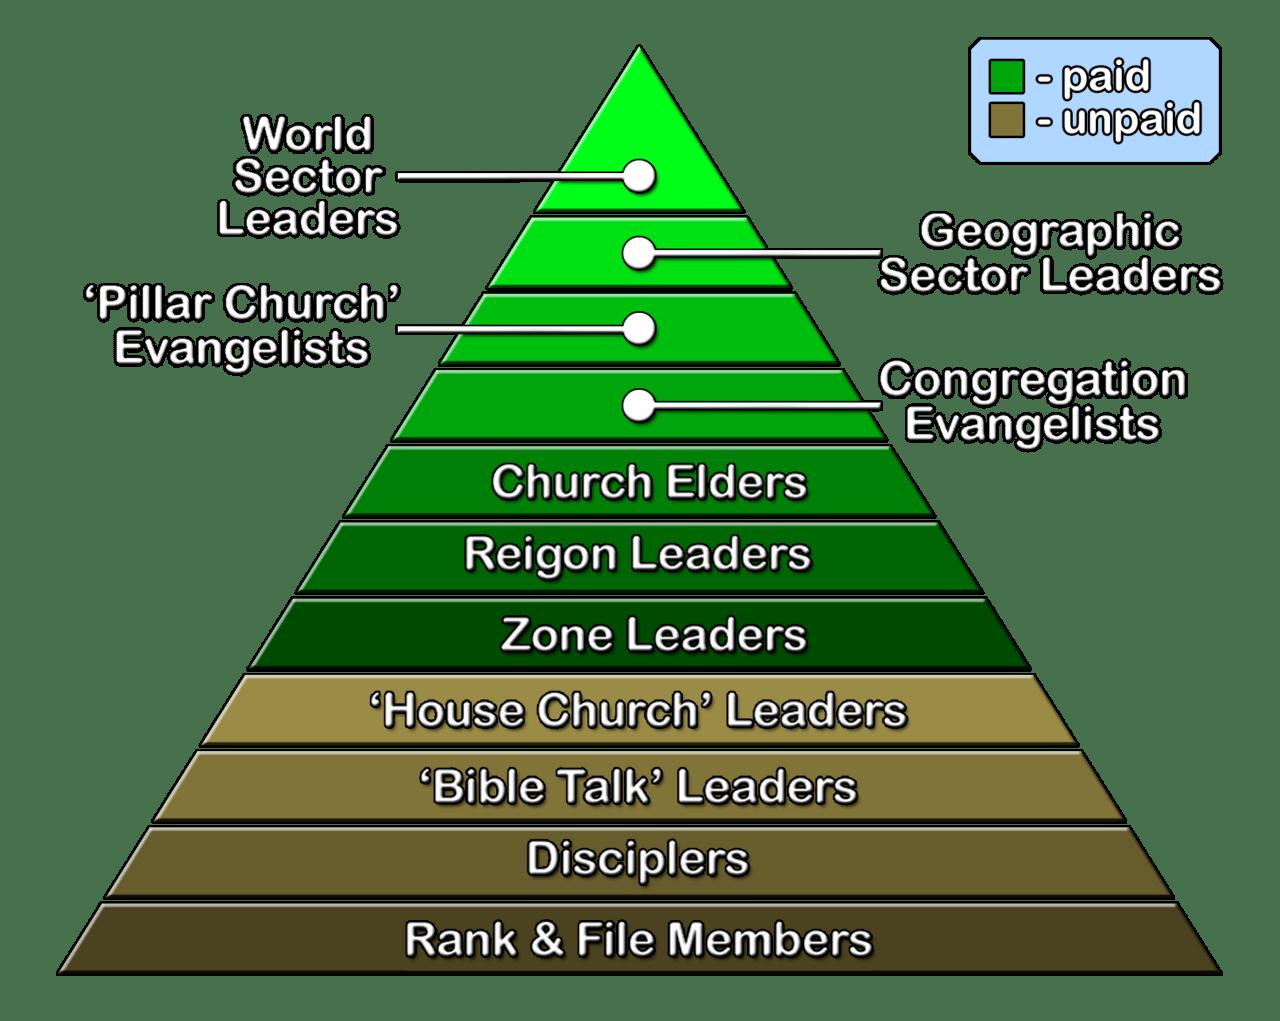 catholic church structure diagram 07 cobalt radio wiring file international churches of christ congregational